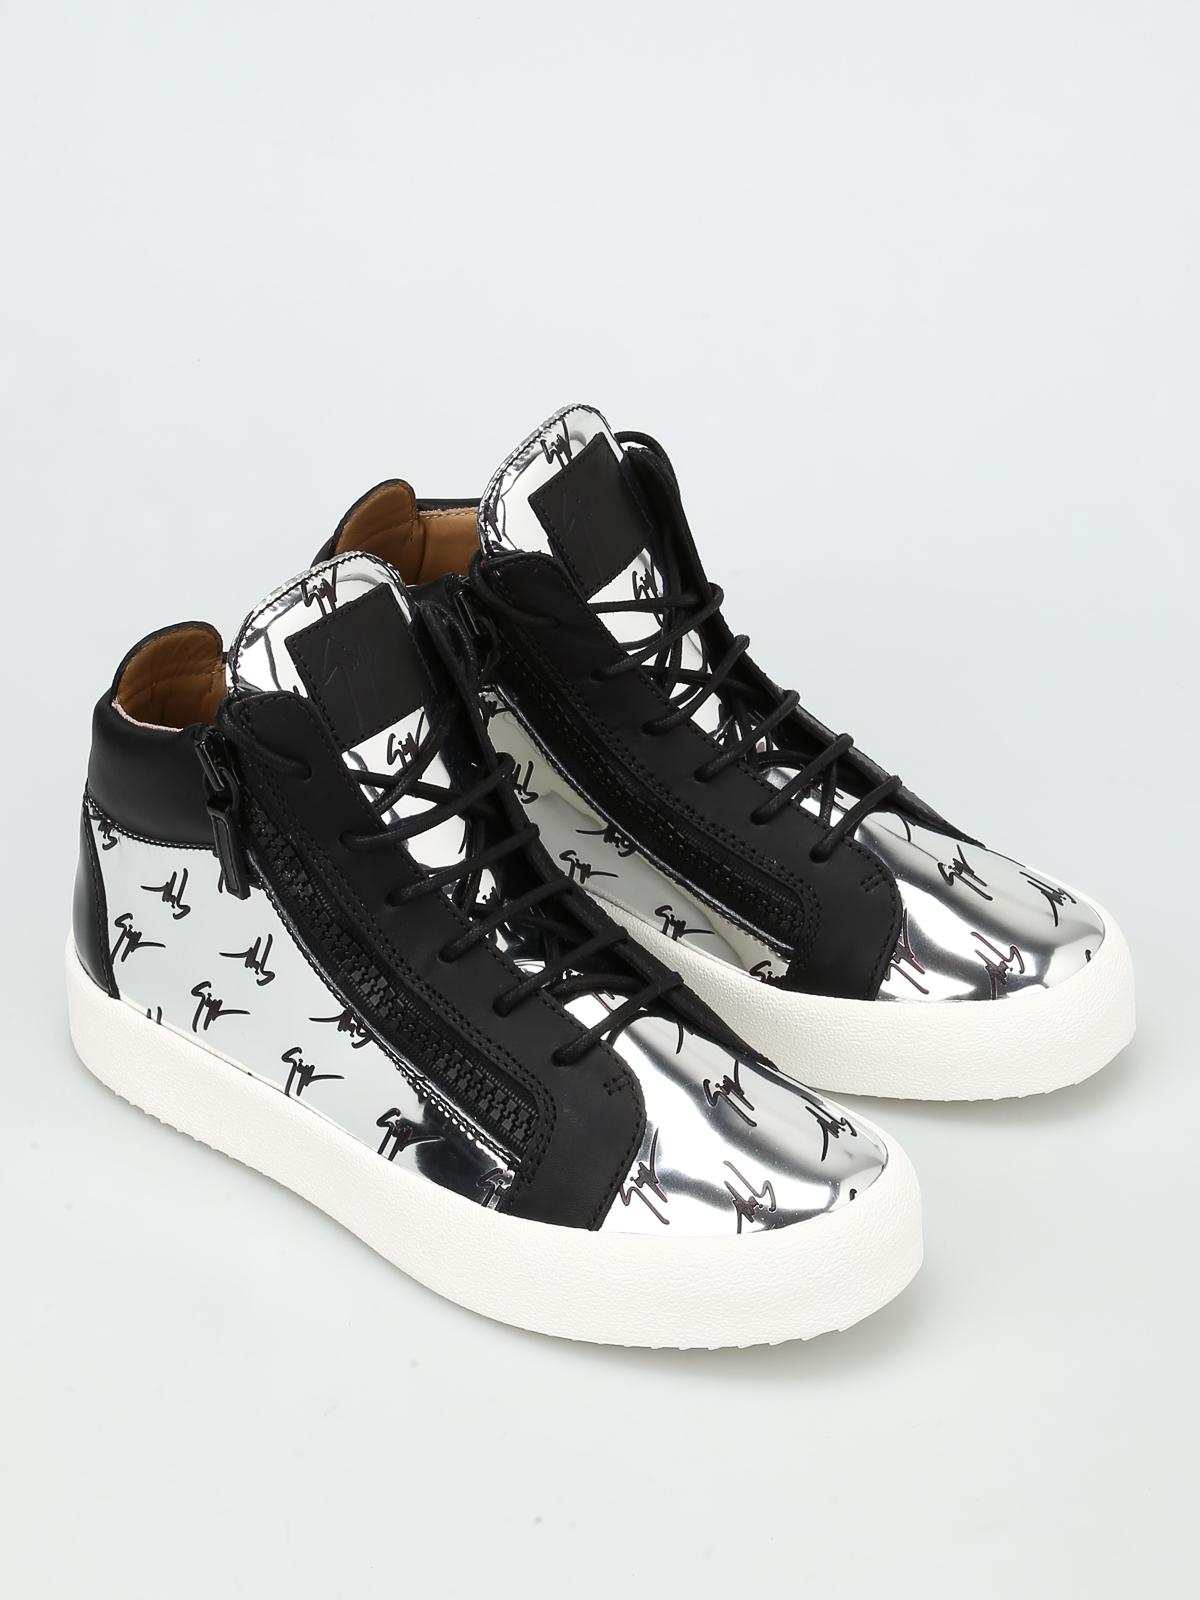 Giuseppe Zanotti - Sneaker alte May London - sneakers - RM7119 00107 41a25d42f35